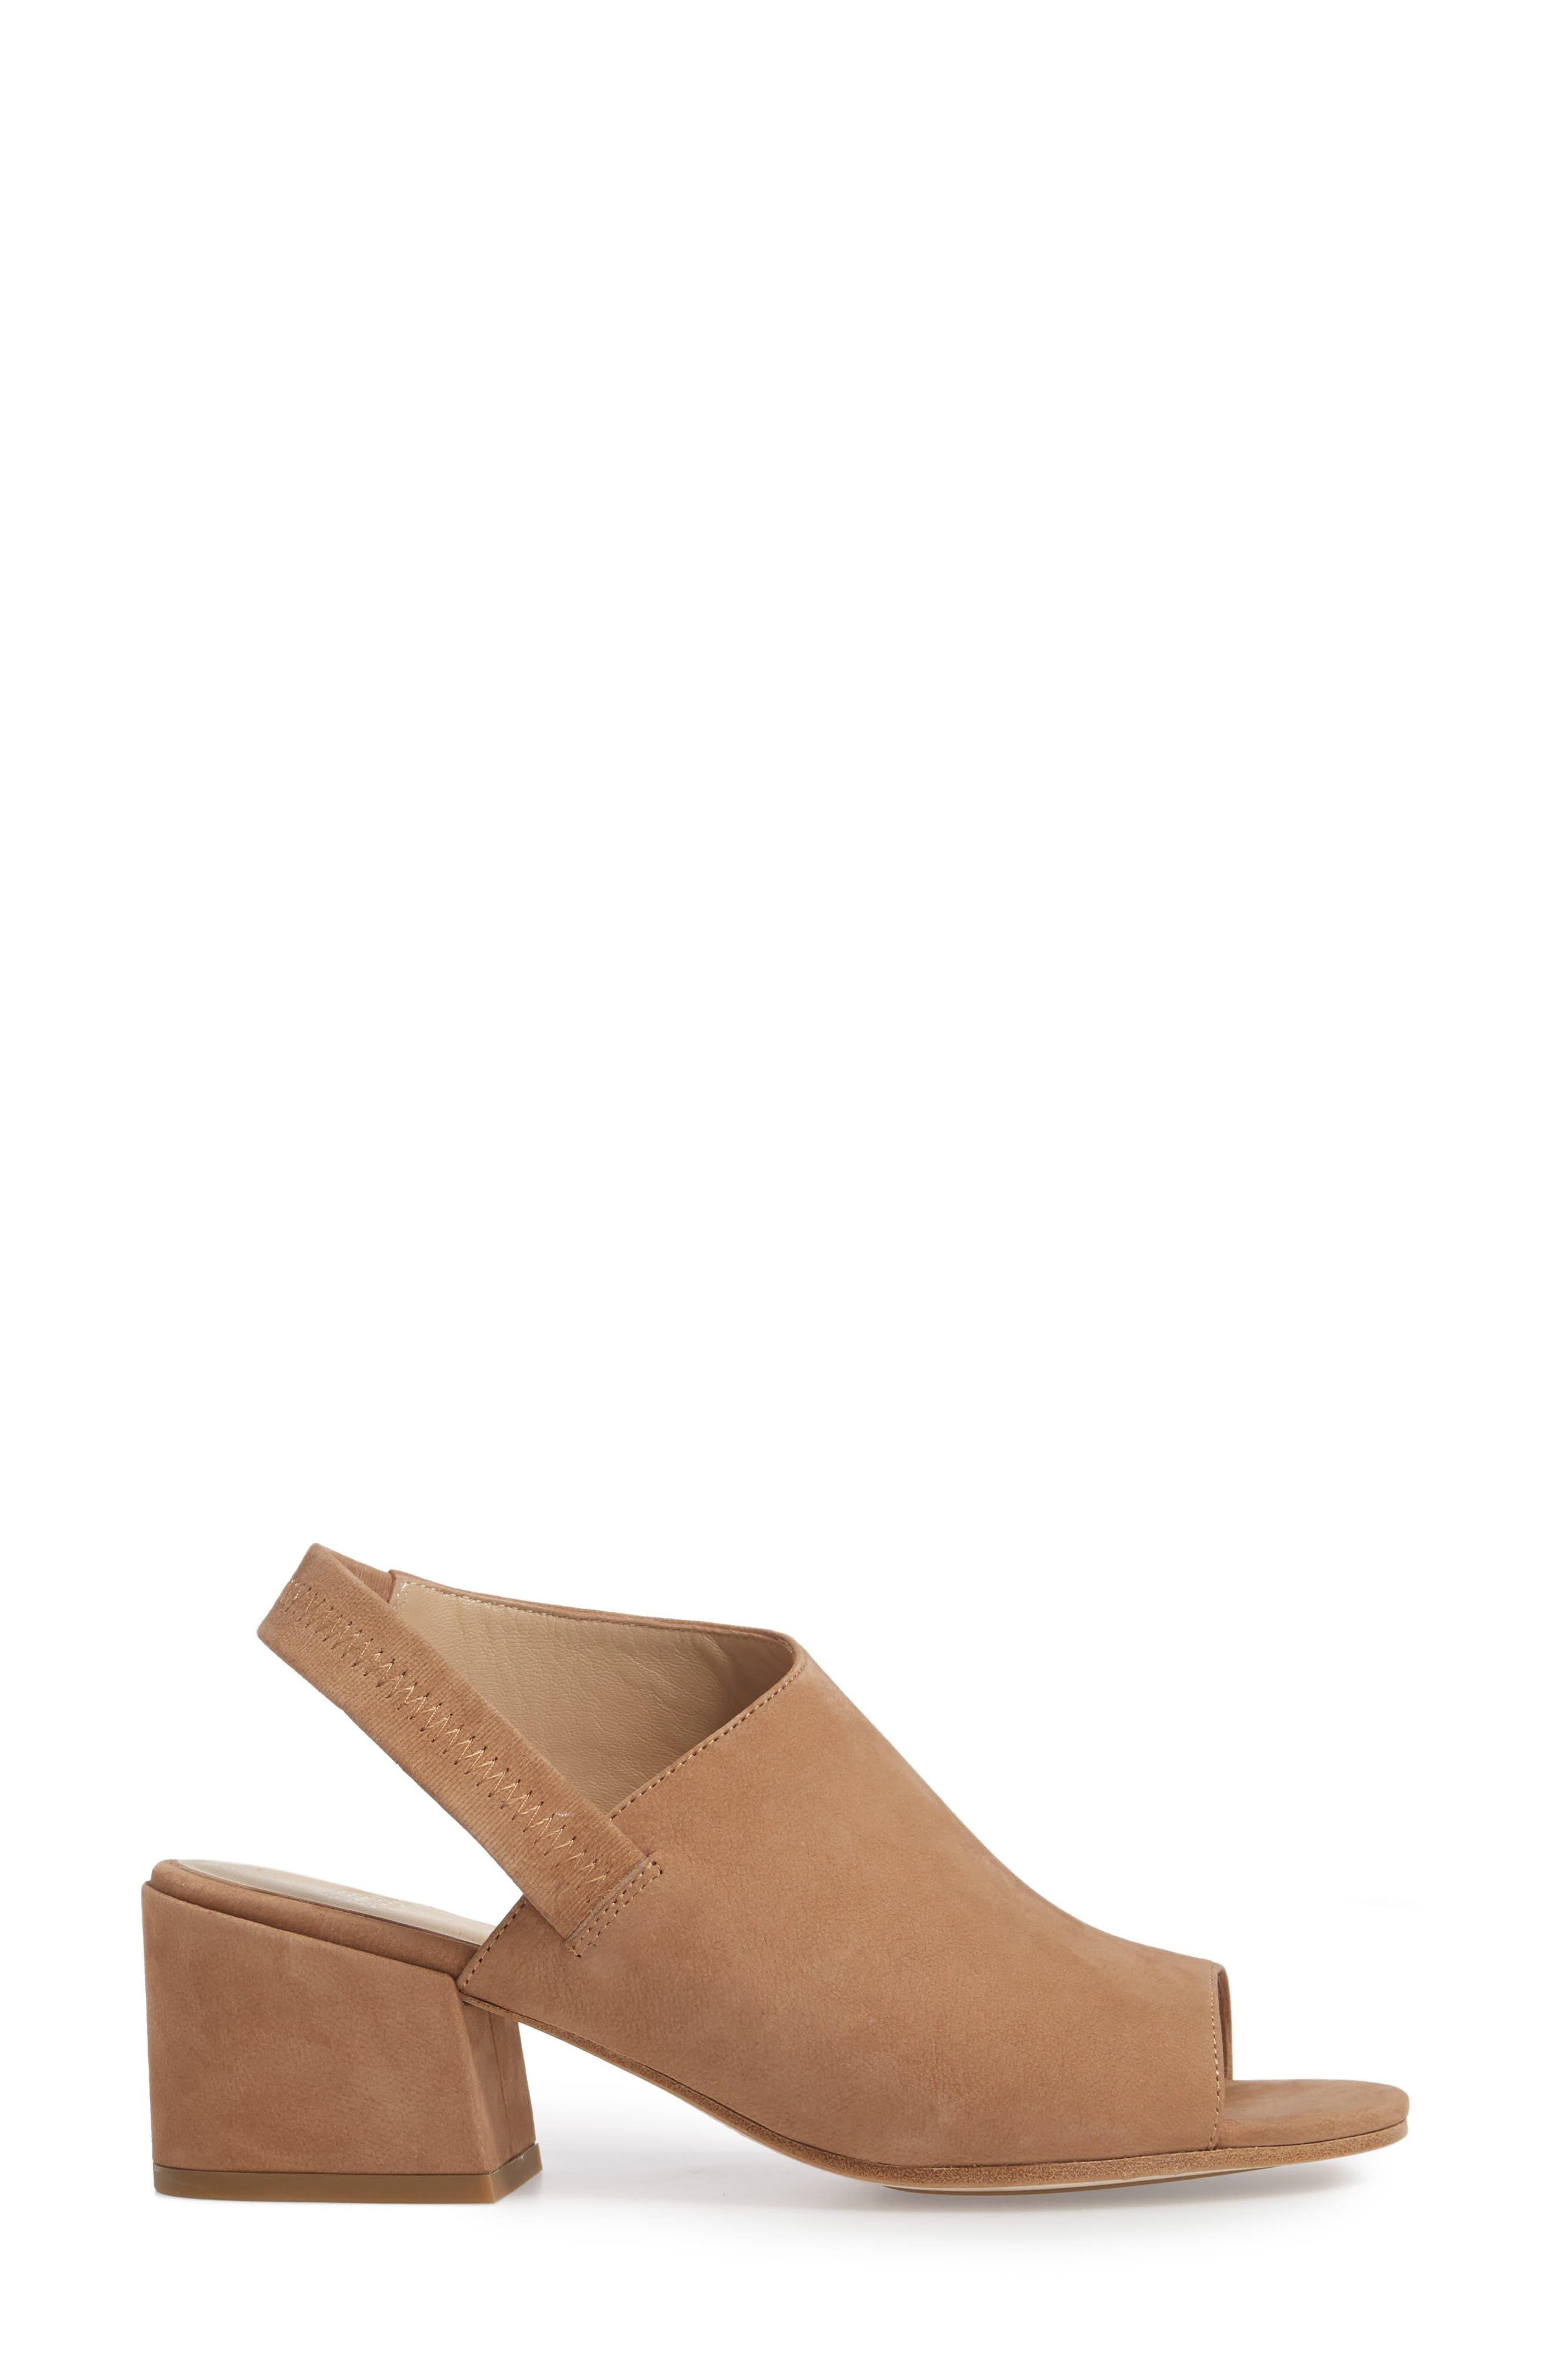 Leigh Asymmetrical Slingback Sandal,                             Alternate thumbnail 8, color,